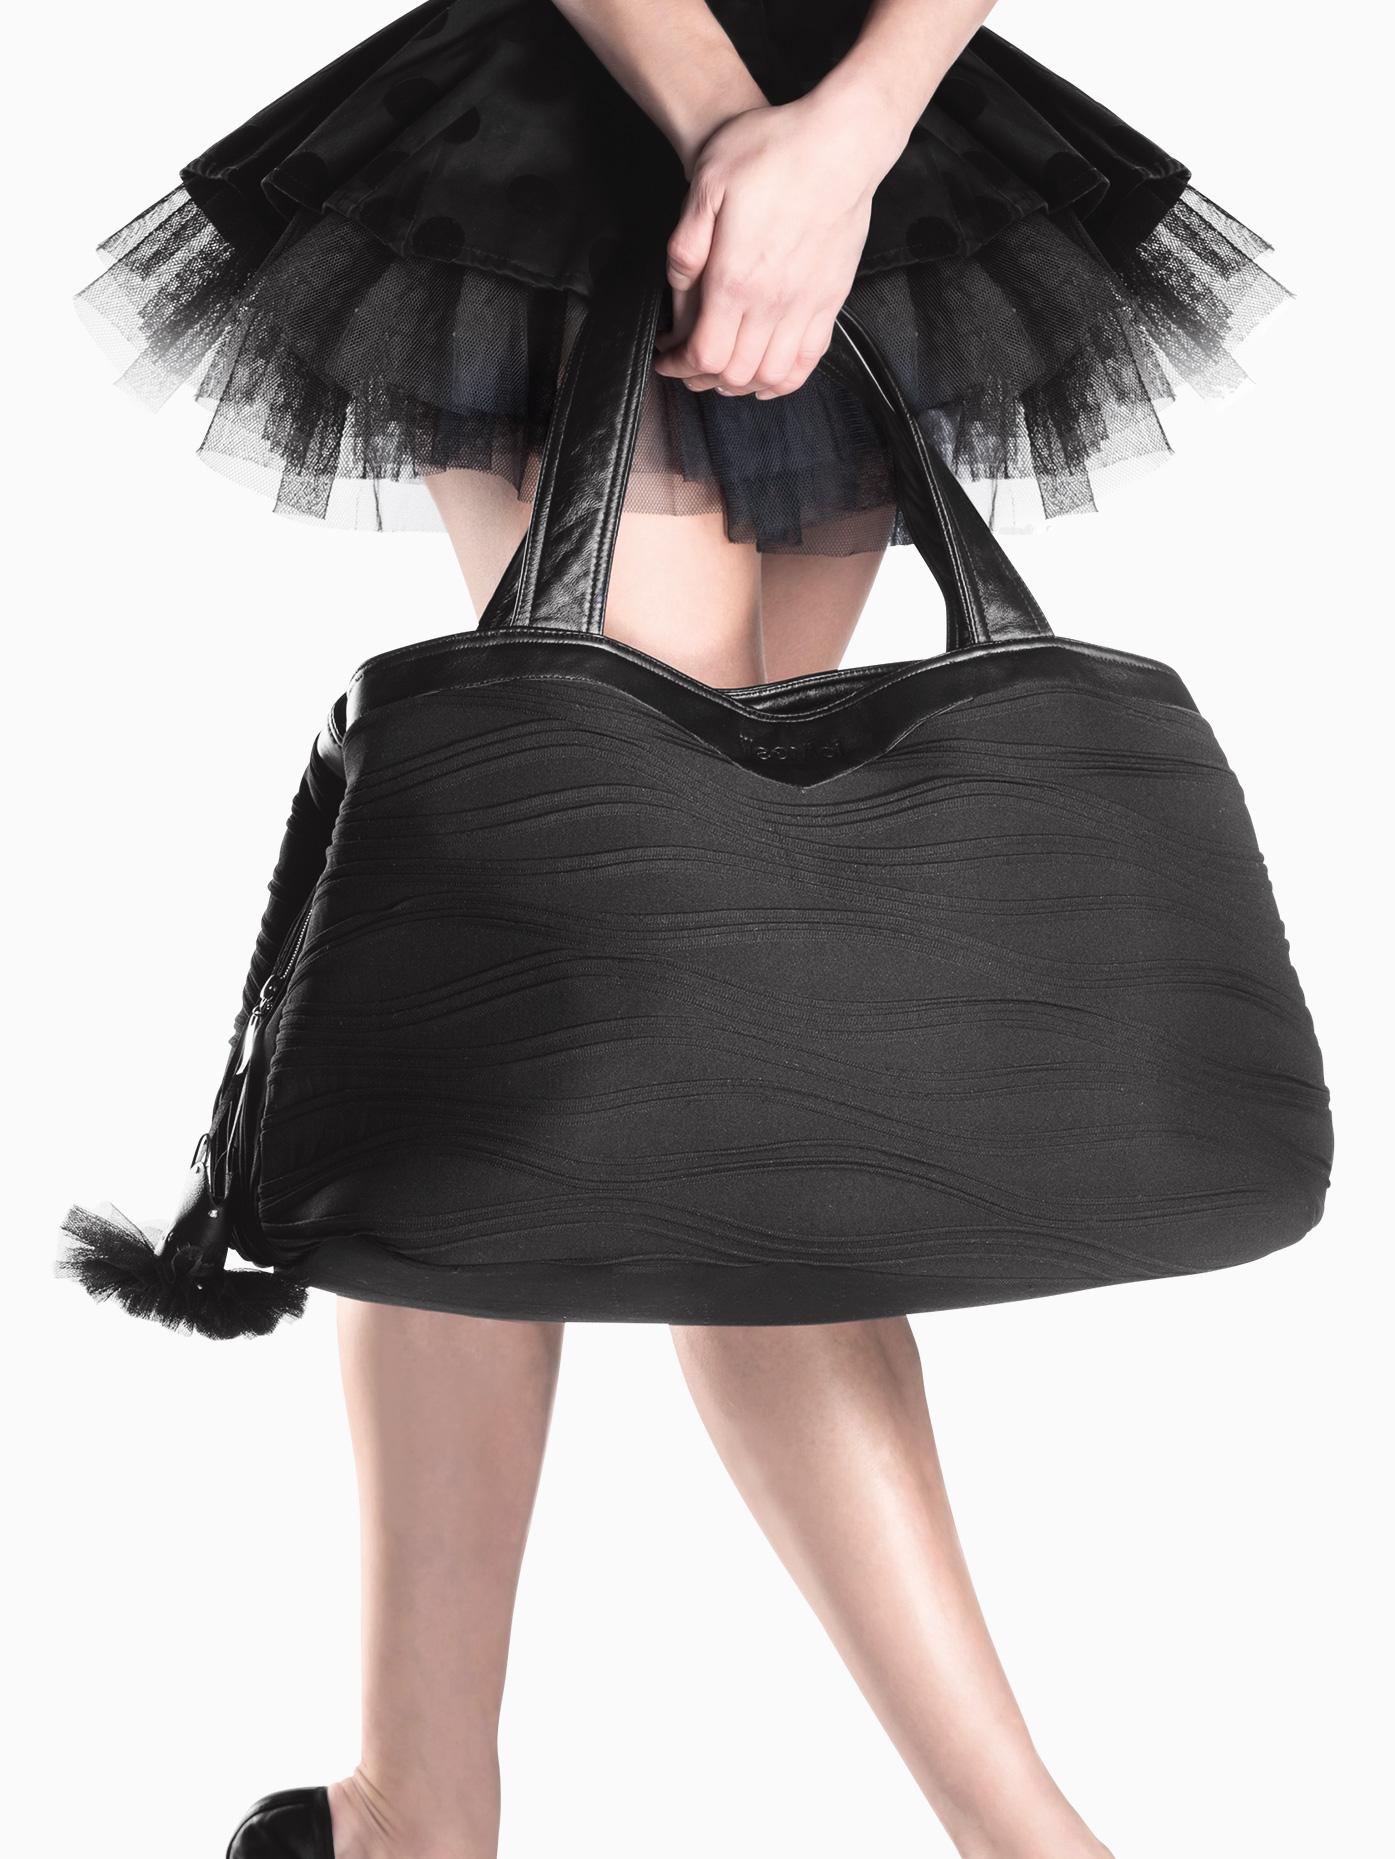 Wear Moi Multi Compartment Leather & Microfiber Dance Bag DIV66